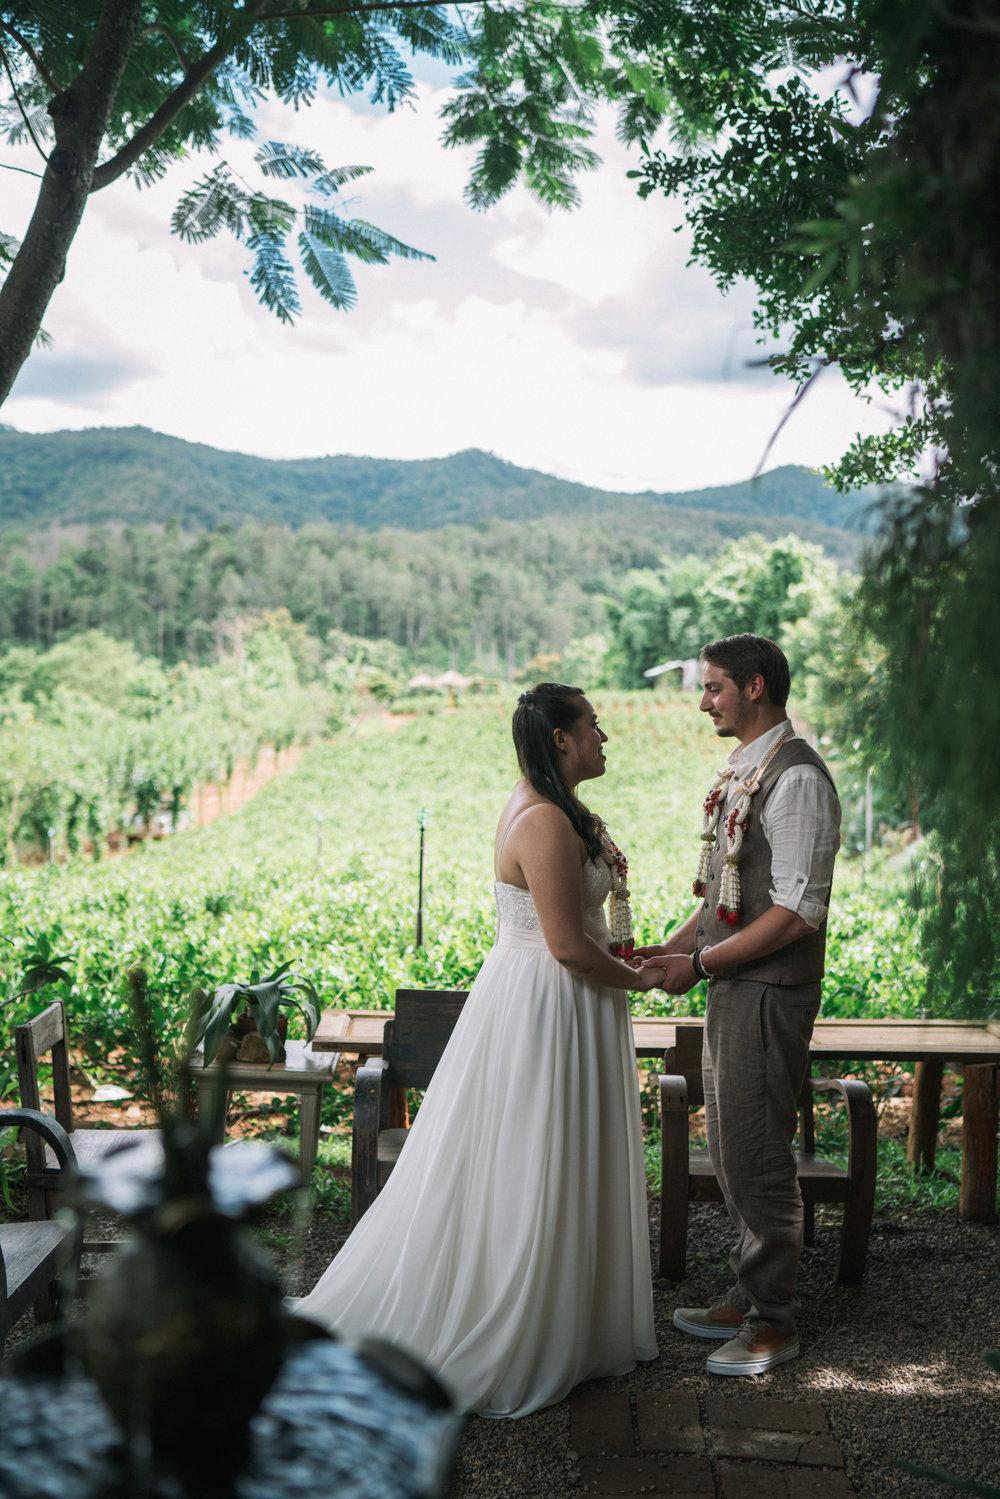 Thai style wedding photography at Thai temple by Chiang Mai photographer Sean Dalton